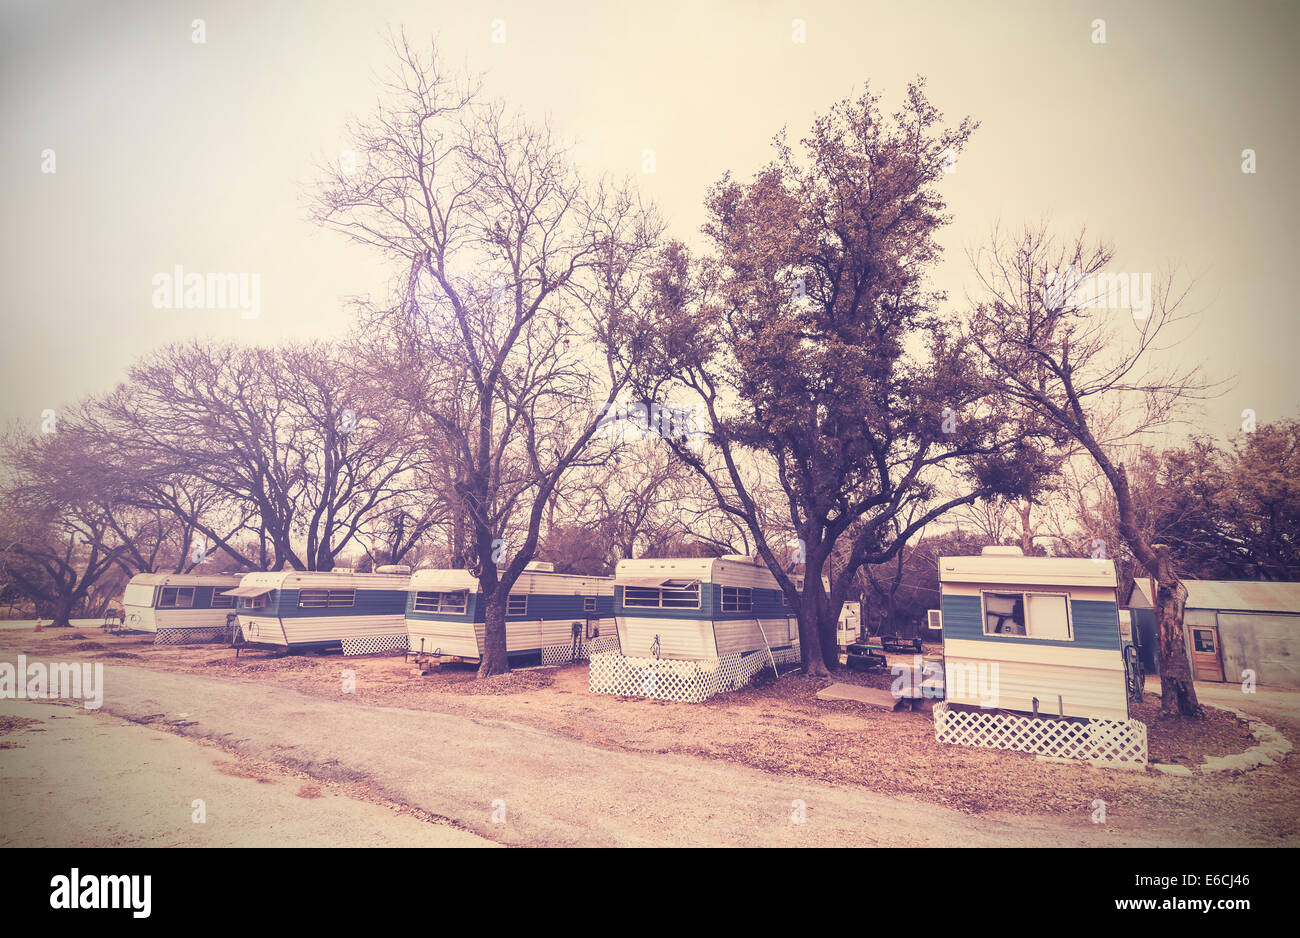 Imagen vintage de american house remolques estate, EE.UU. rurales. Imagen De Stock